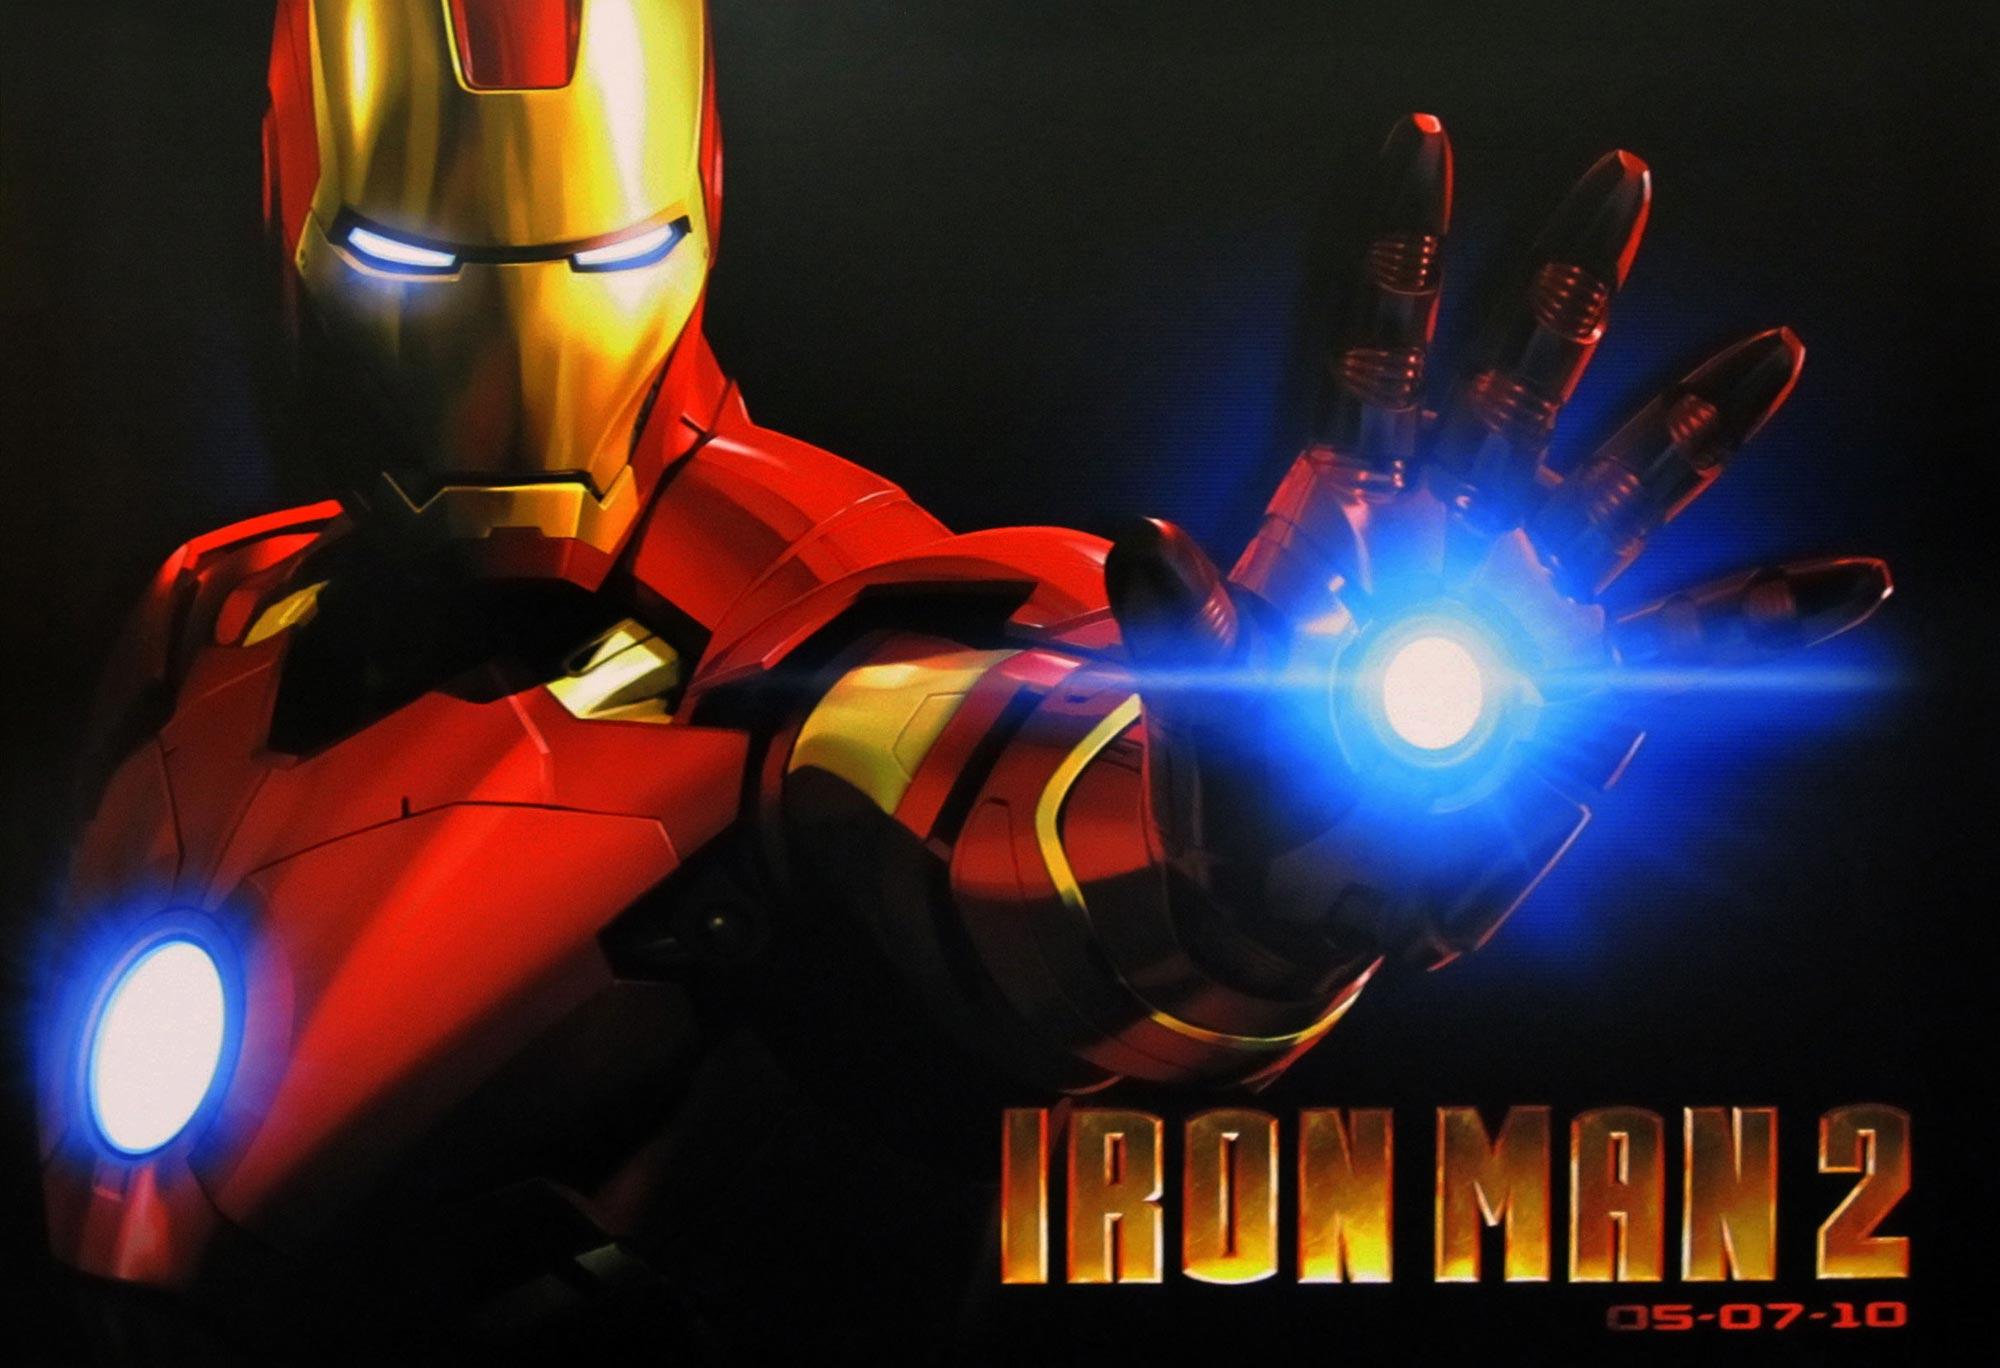 http://jovemnerd.ig.com.br/wp-content/uploads/iron_man_2_poster.jpg